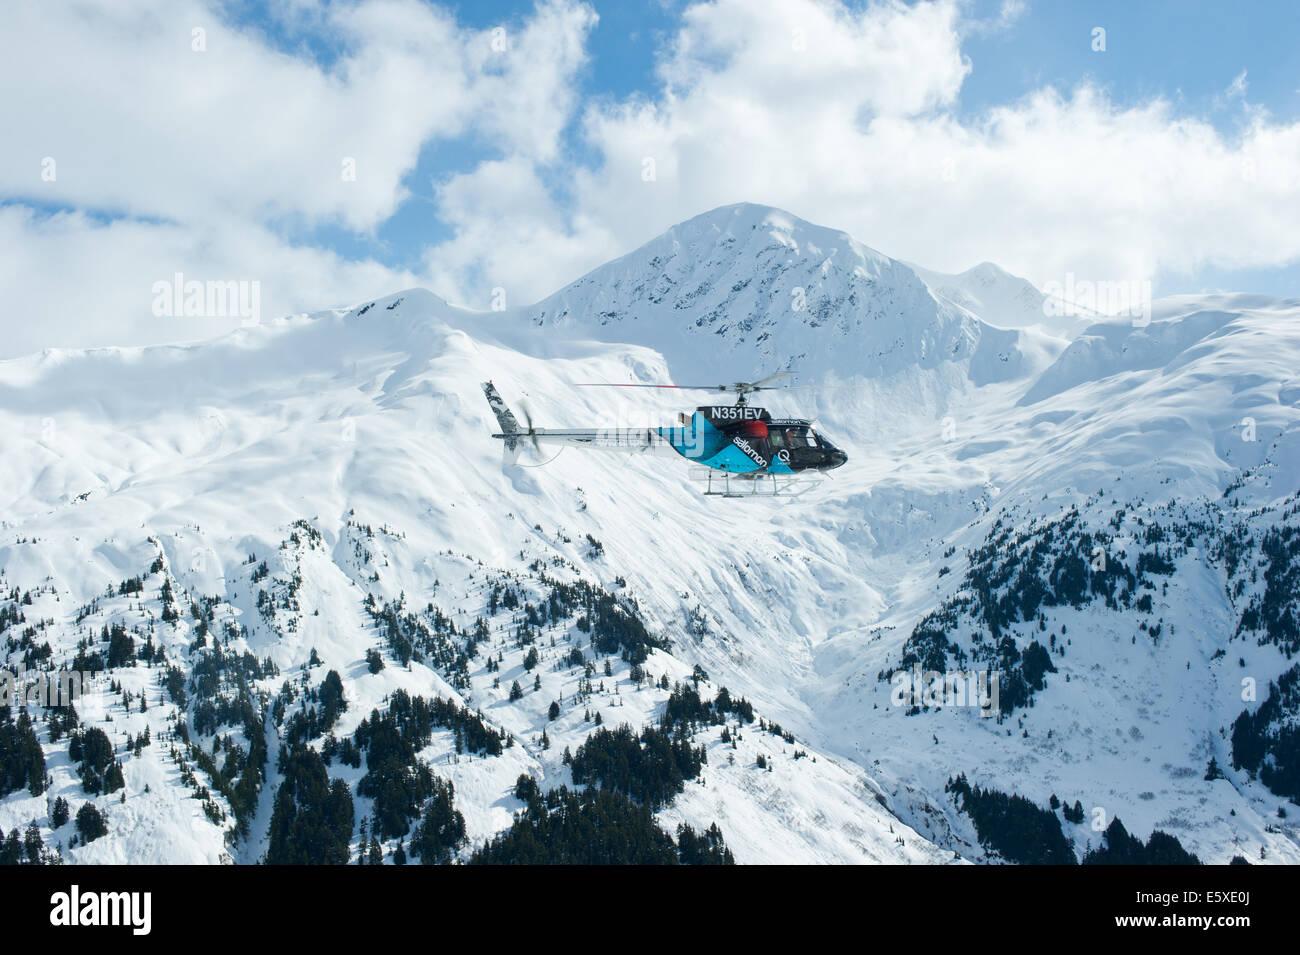 Chugach Powder Guides Salomon Helicopter, Girdwood, Alaska. - Stock Image